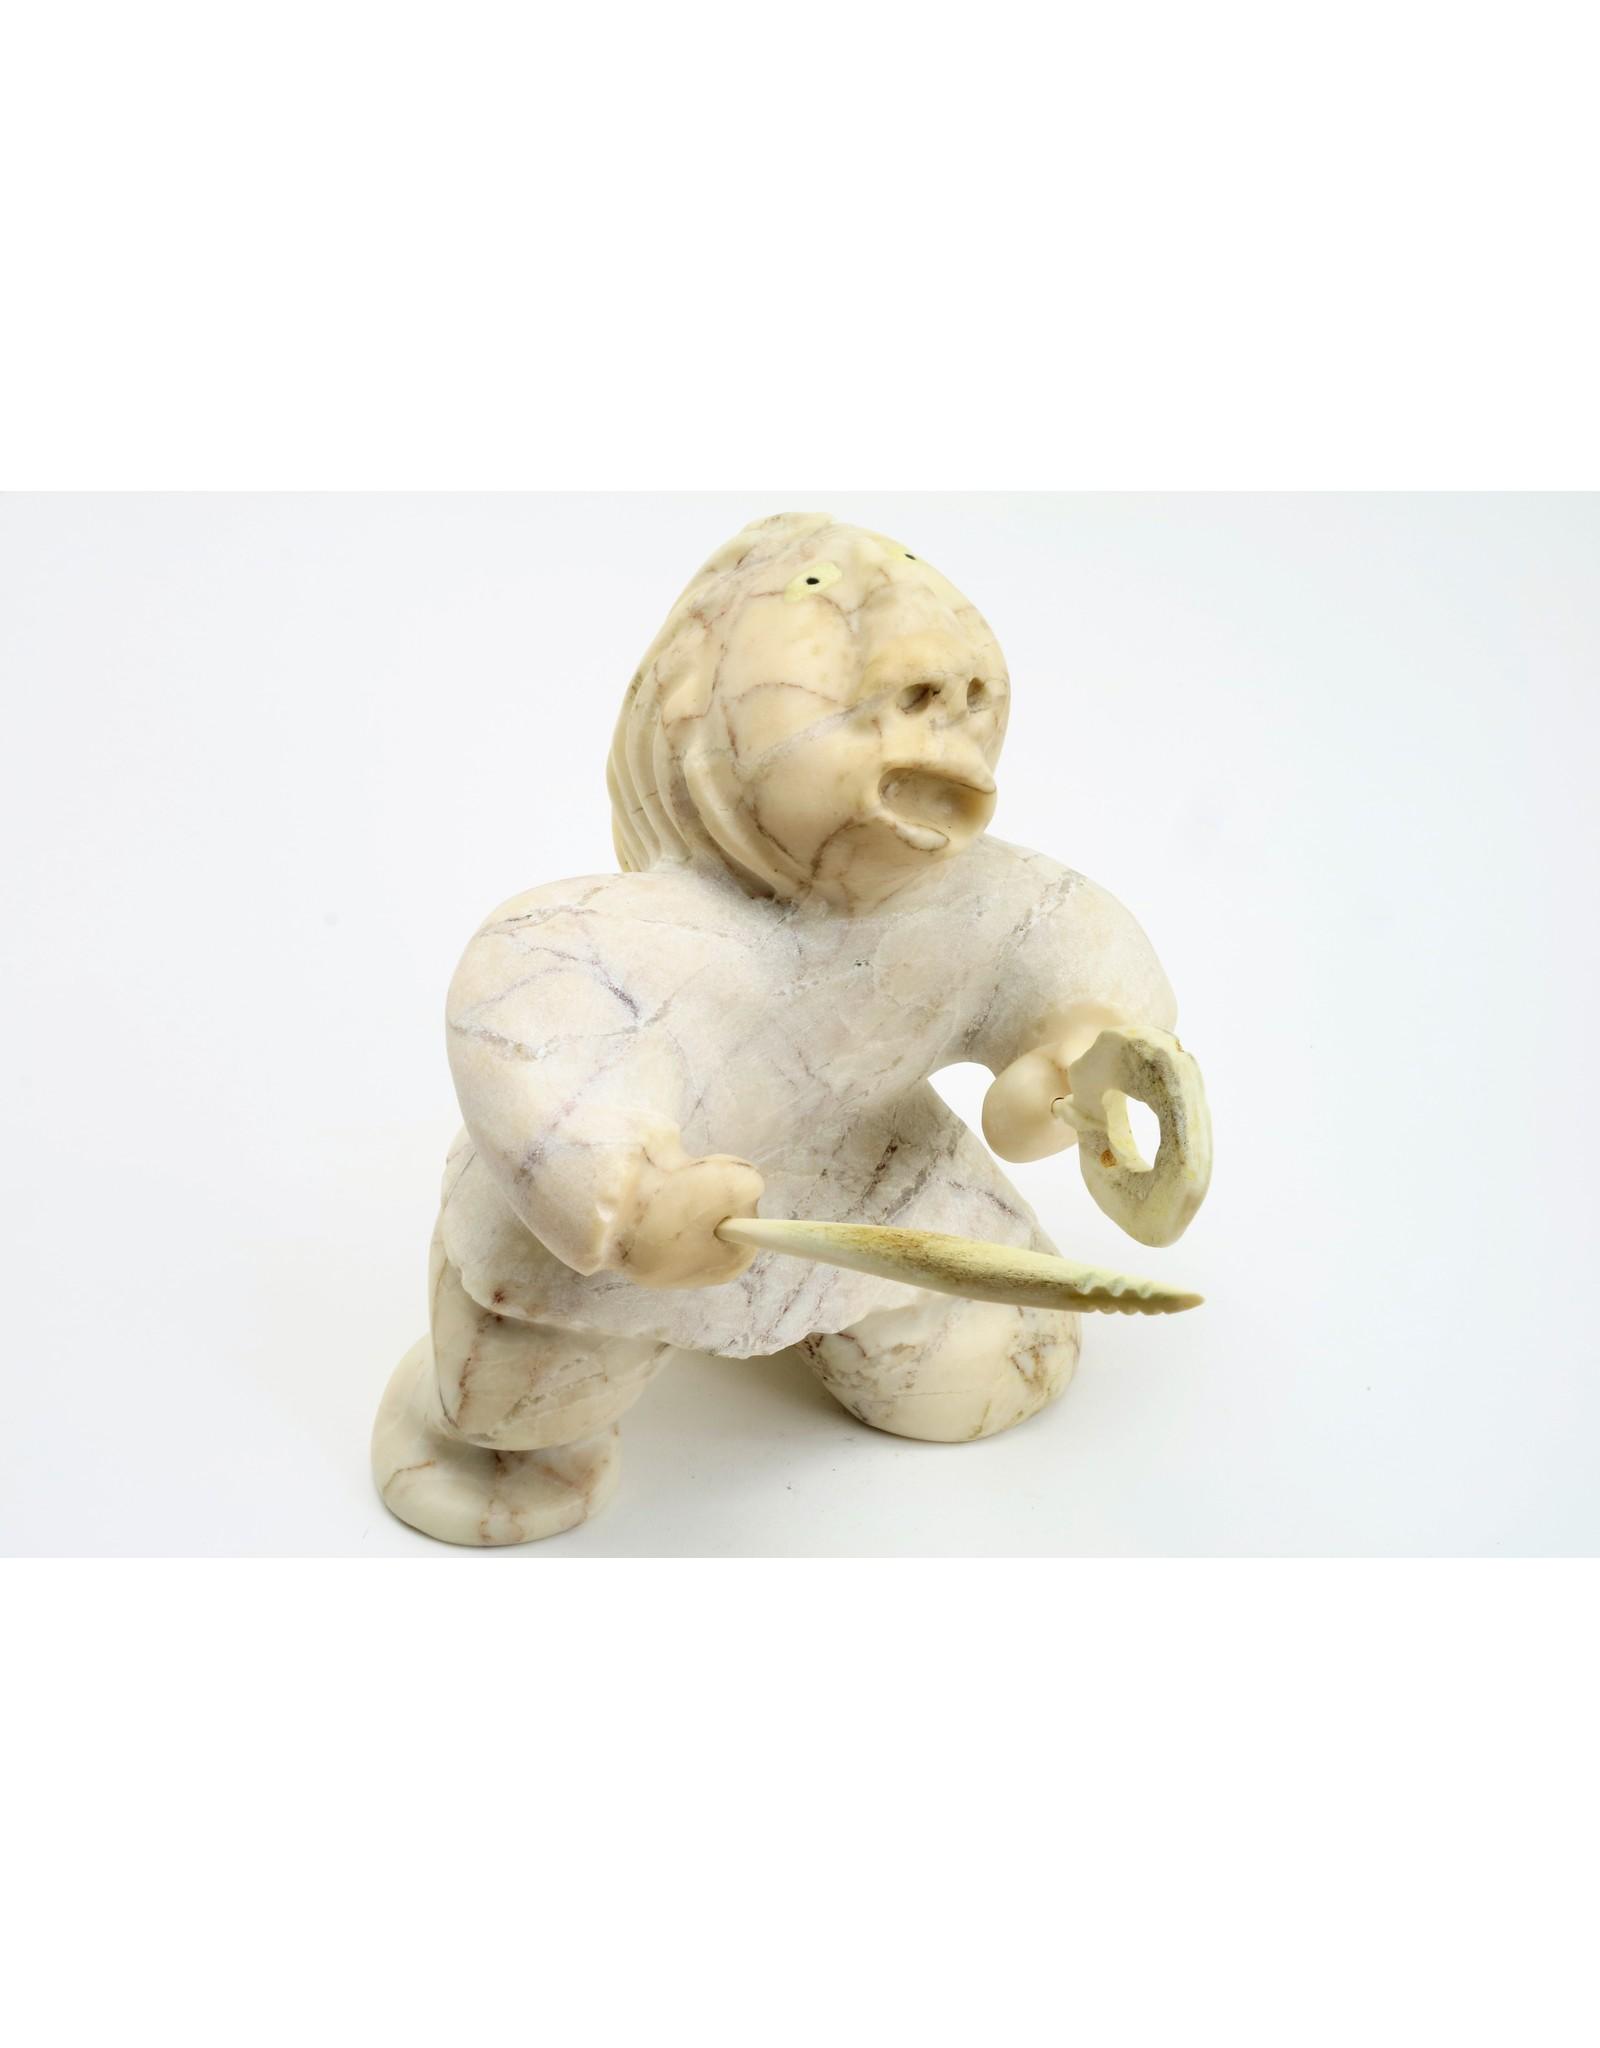 Gjoa Haven Drum Dancer